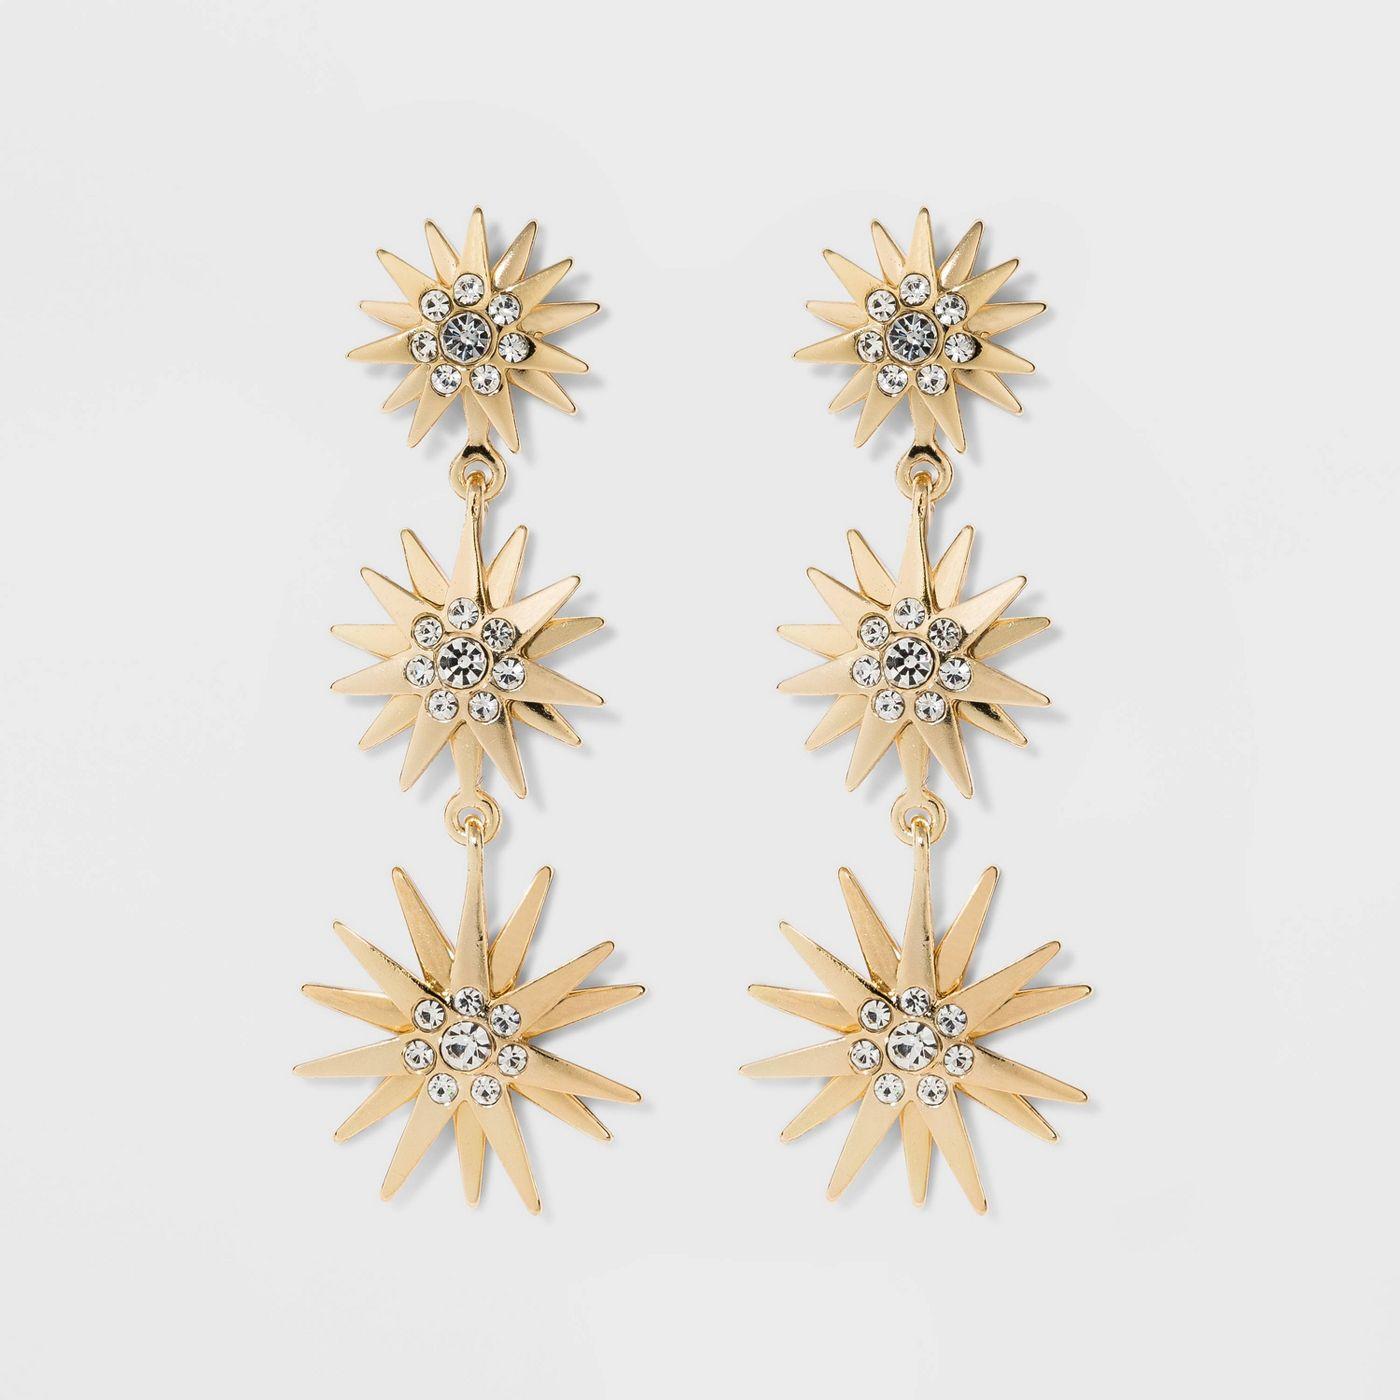 SUGARFIX by BaubleBar Crystal Sunburst Drop Earrings - Clear - image 1 of 8